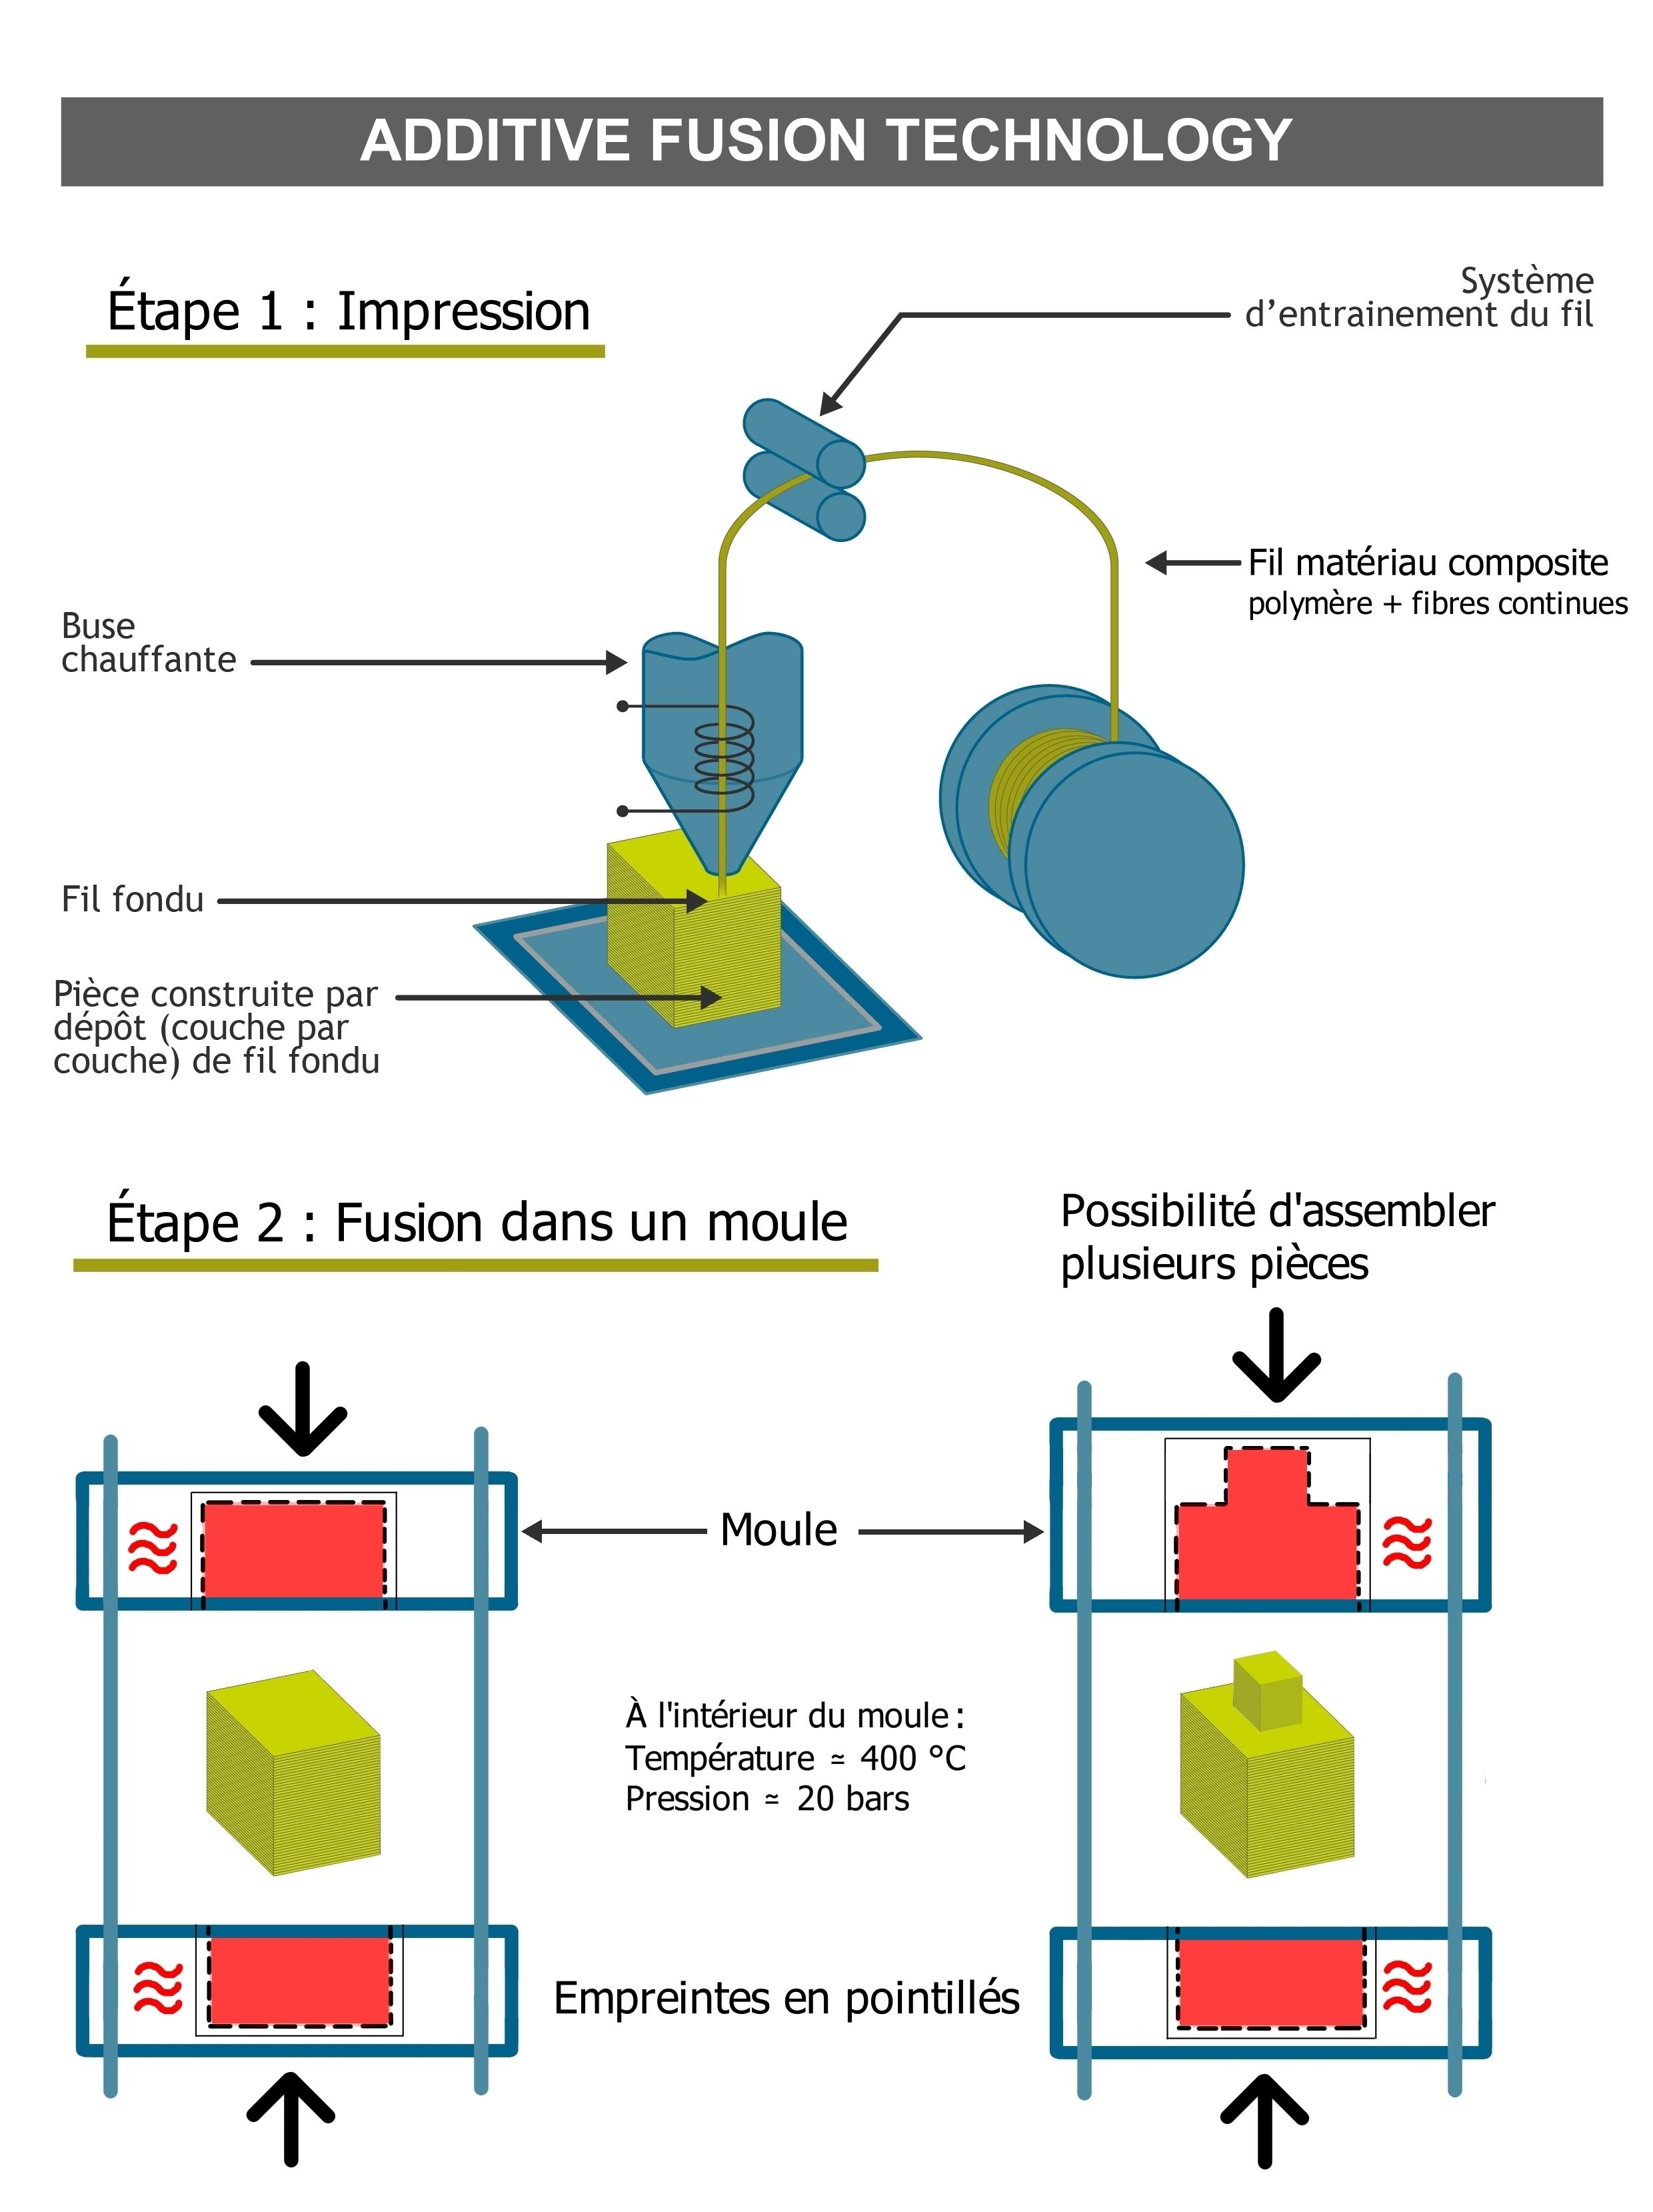 Fabrication Additive - Processus Additive Fusion Technology